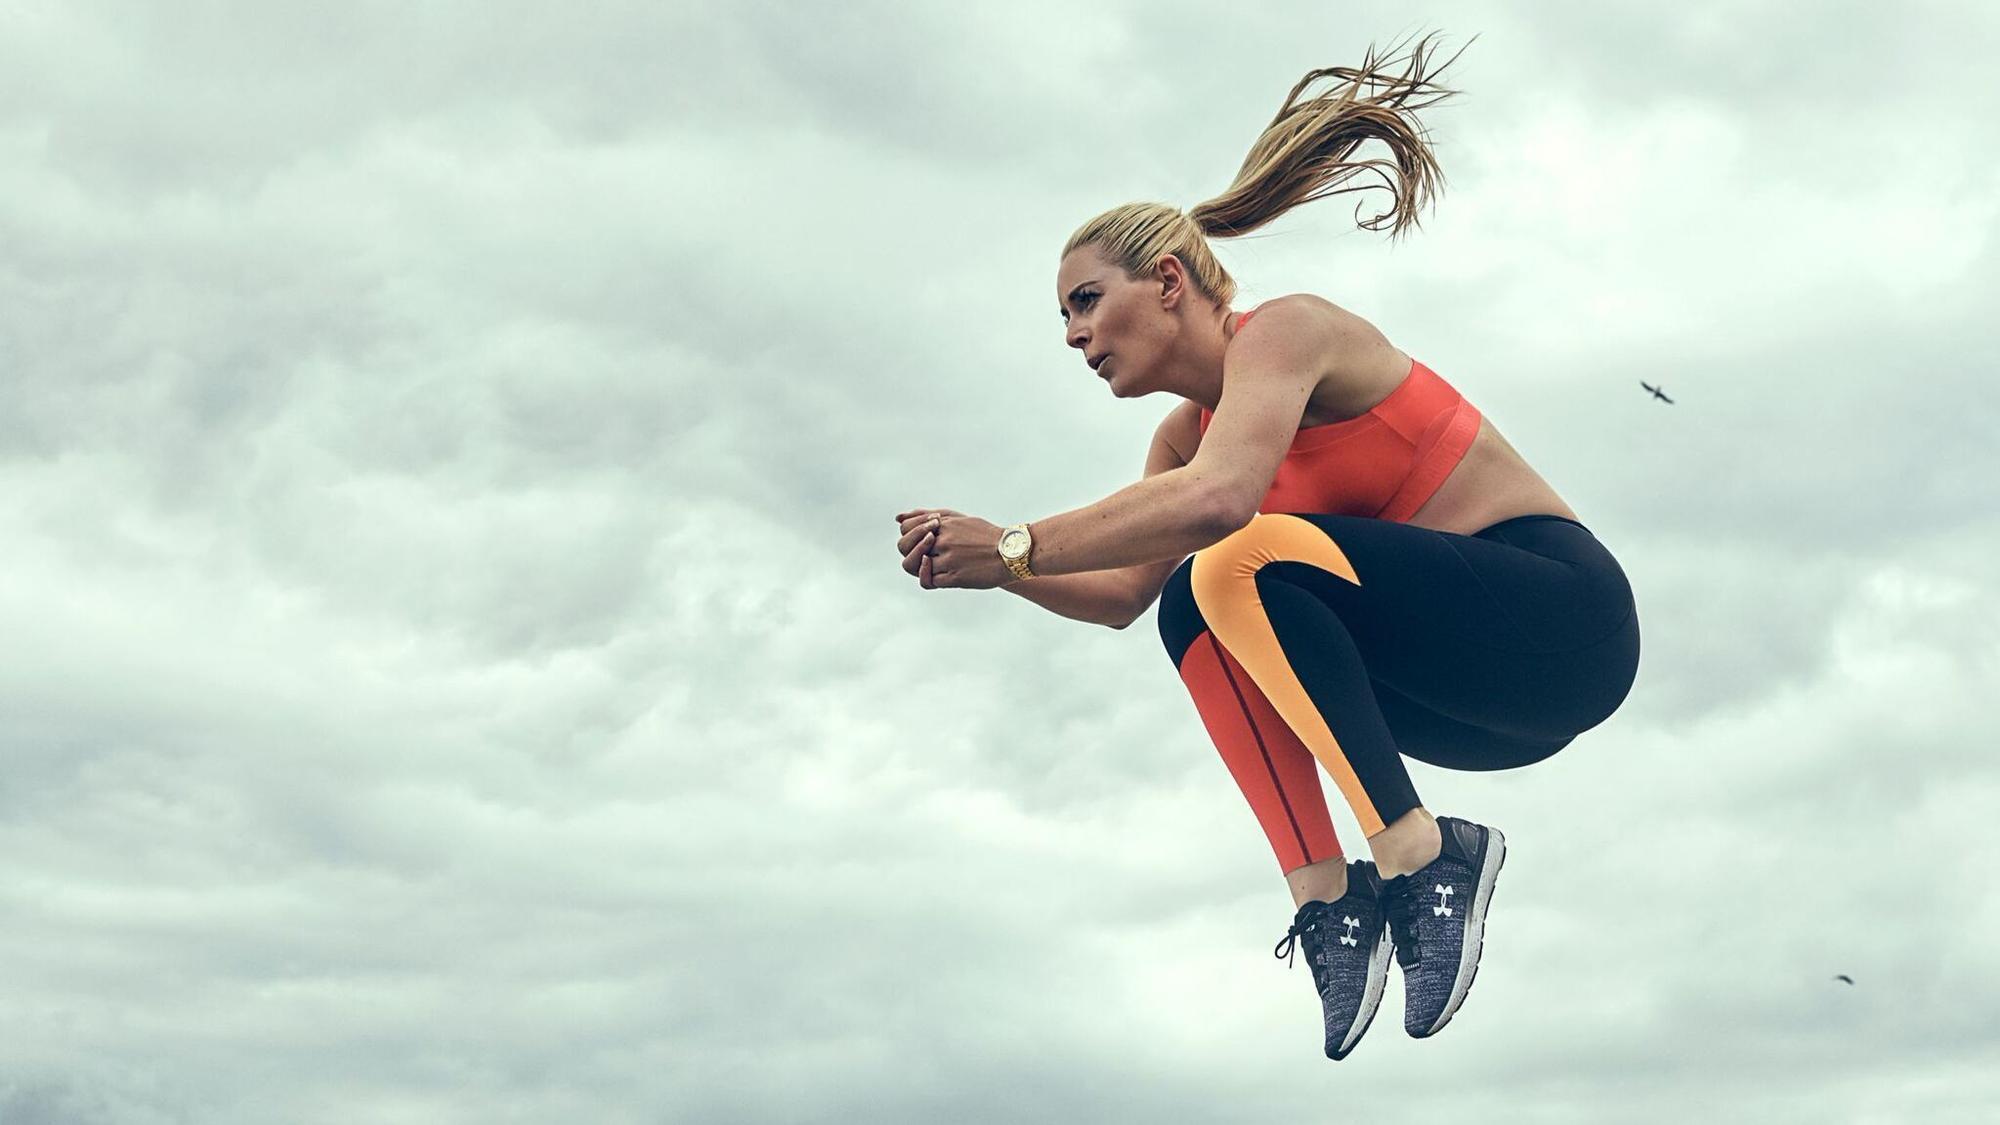 Under Armour Unveils Lindsey Vonn Film Ahead Of Olympics